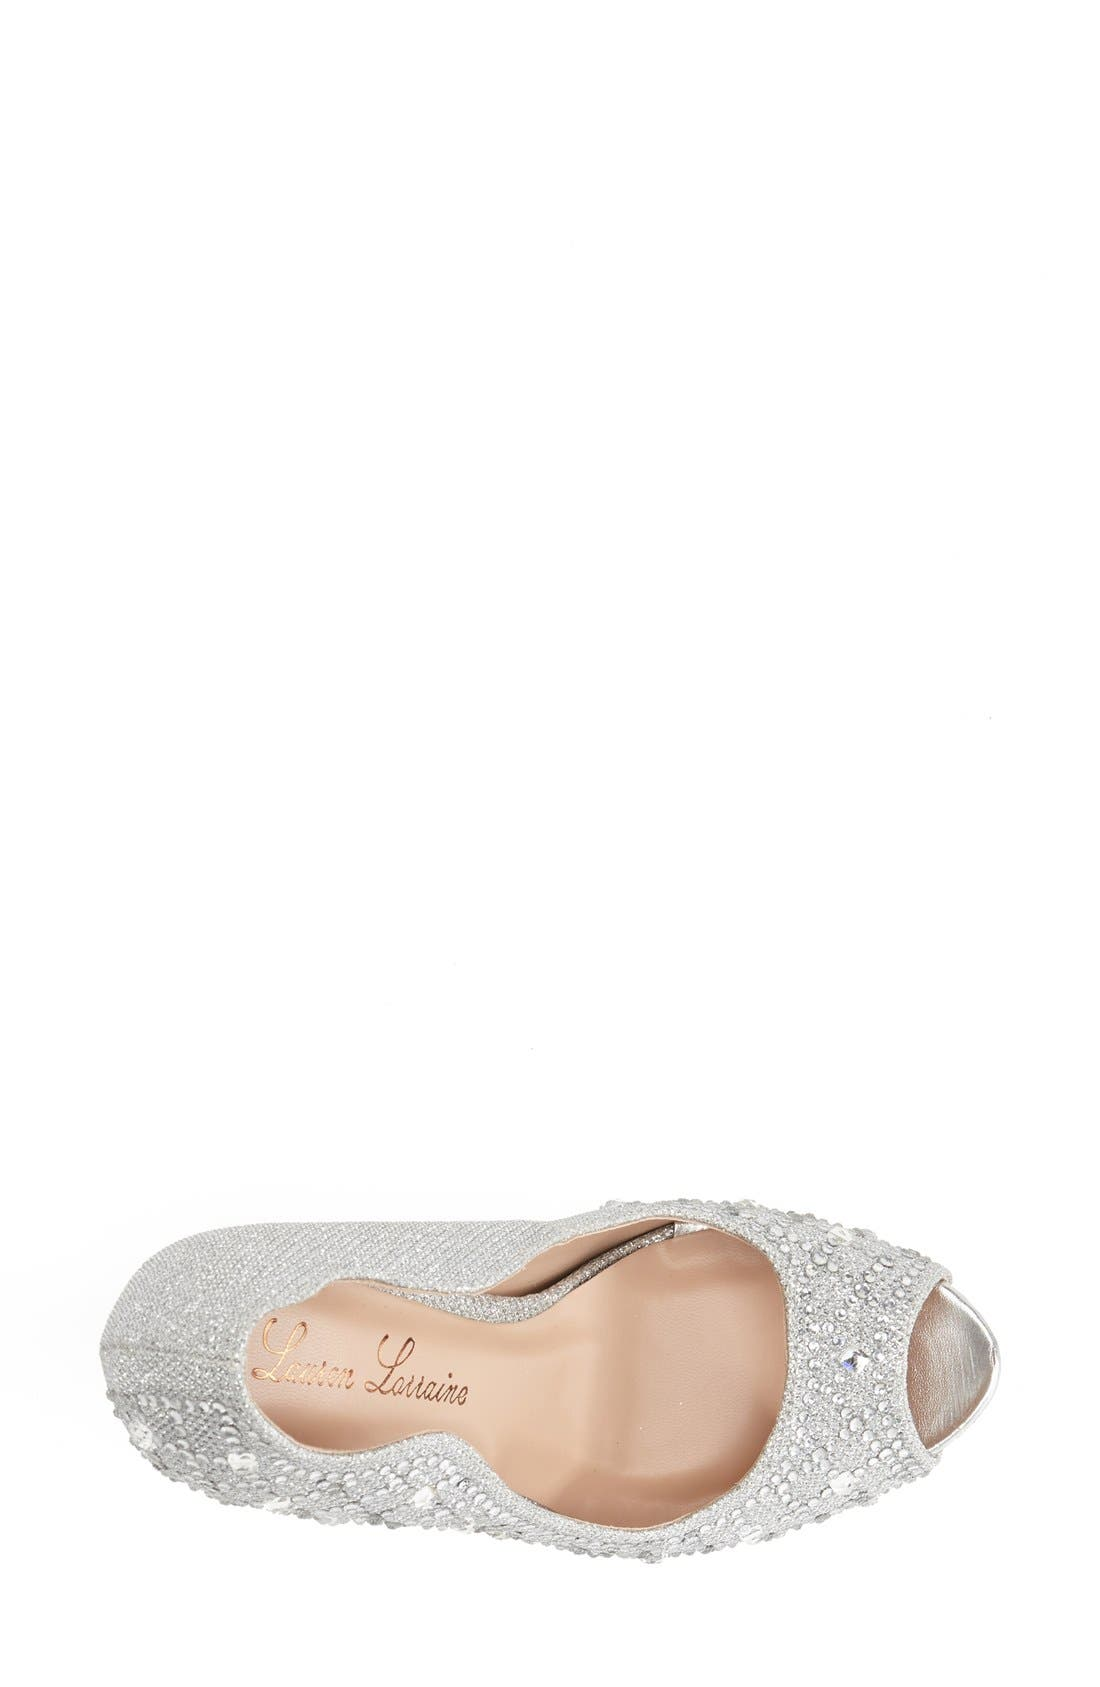 Alternate Image 3  - Lauren Lorraine 'Kylie Jewel' Peep Toe Platform Pump (Women)